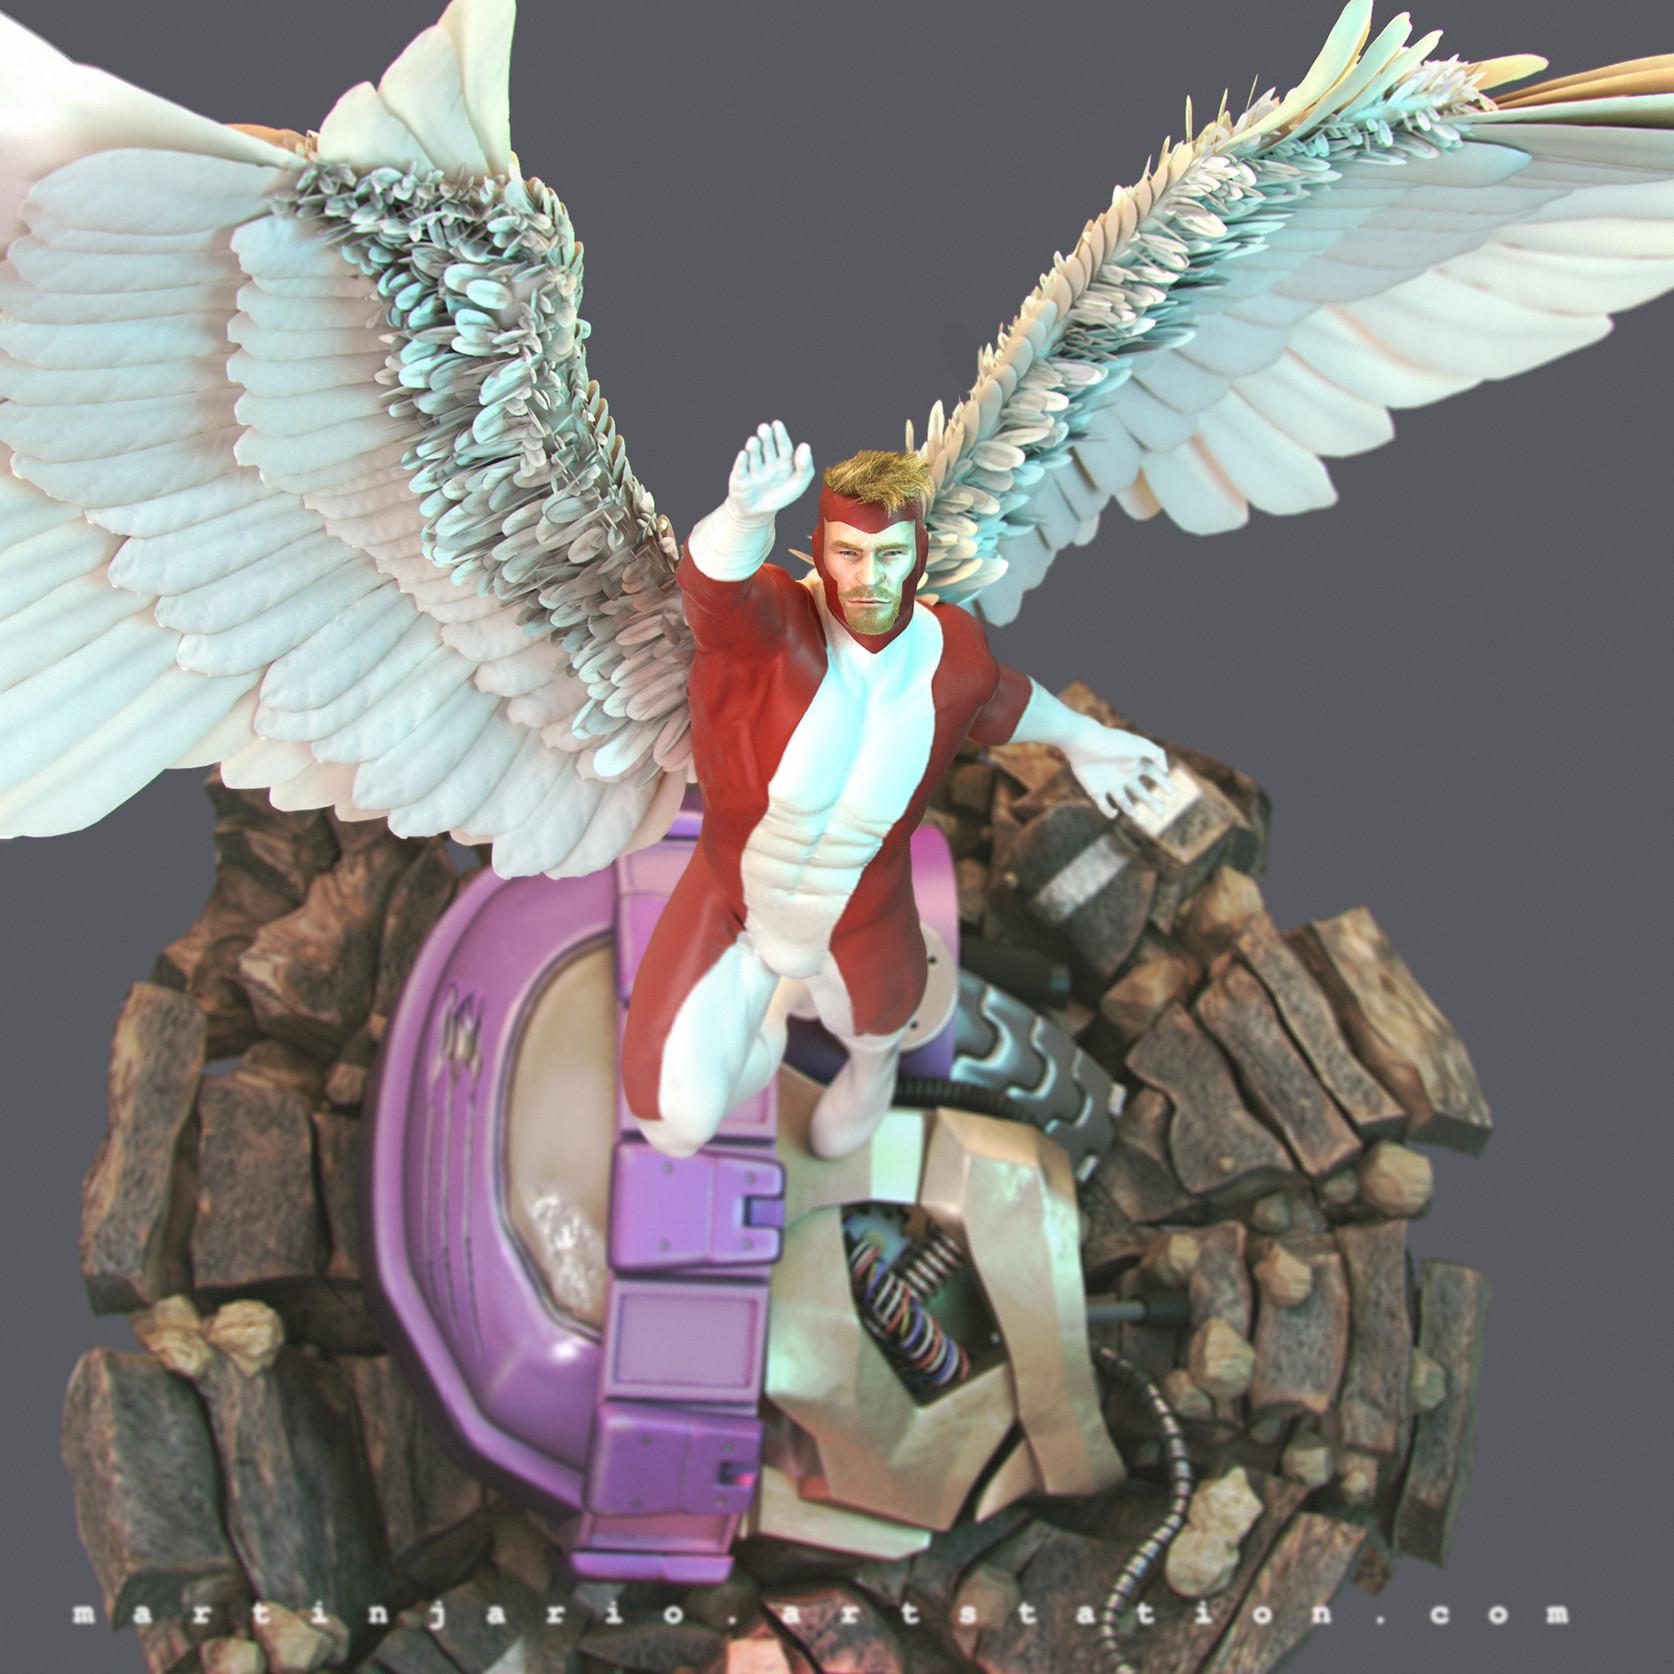 Martin jario martinjario angel xmen zbrush top 2 detail